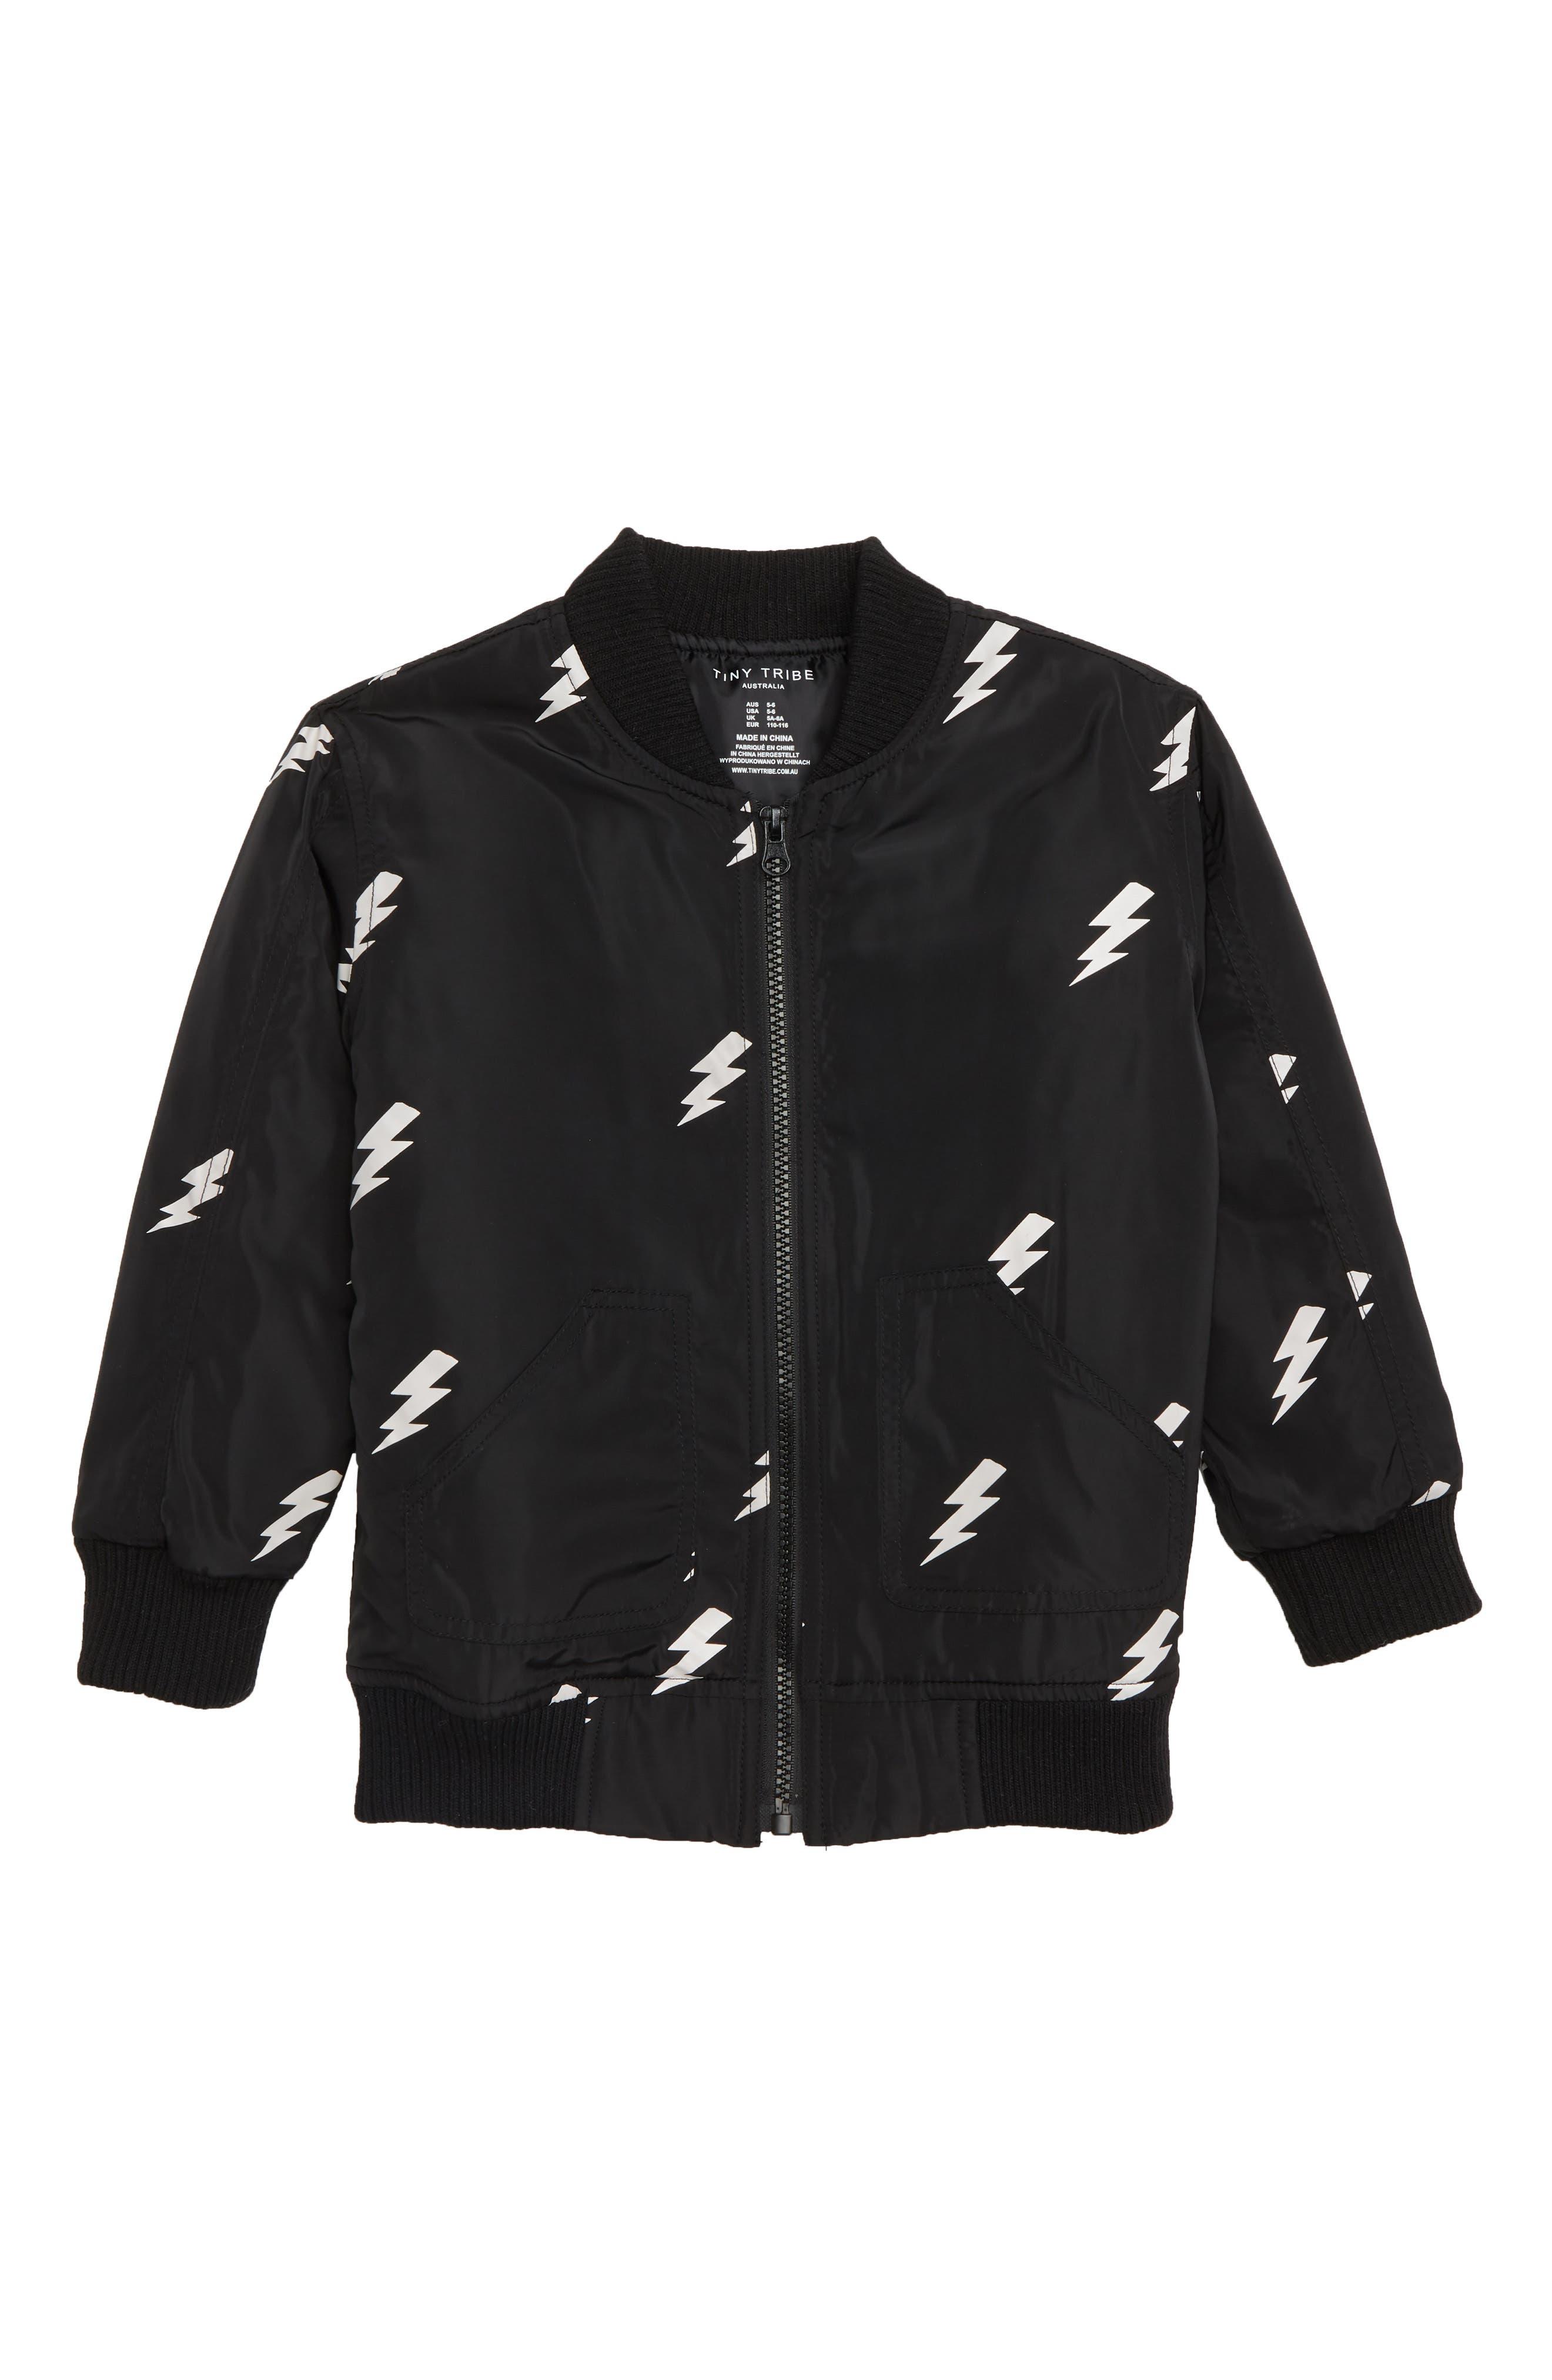 Lightning Bomber Jacket,                             Main thumbnail 1, color,                             BLACK / WHITE